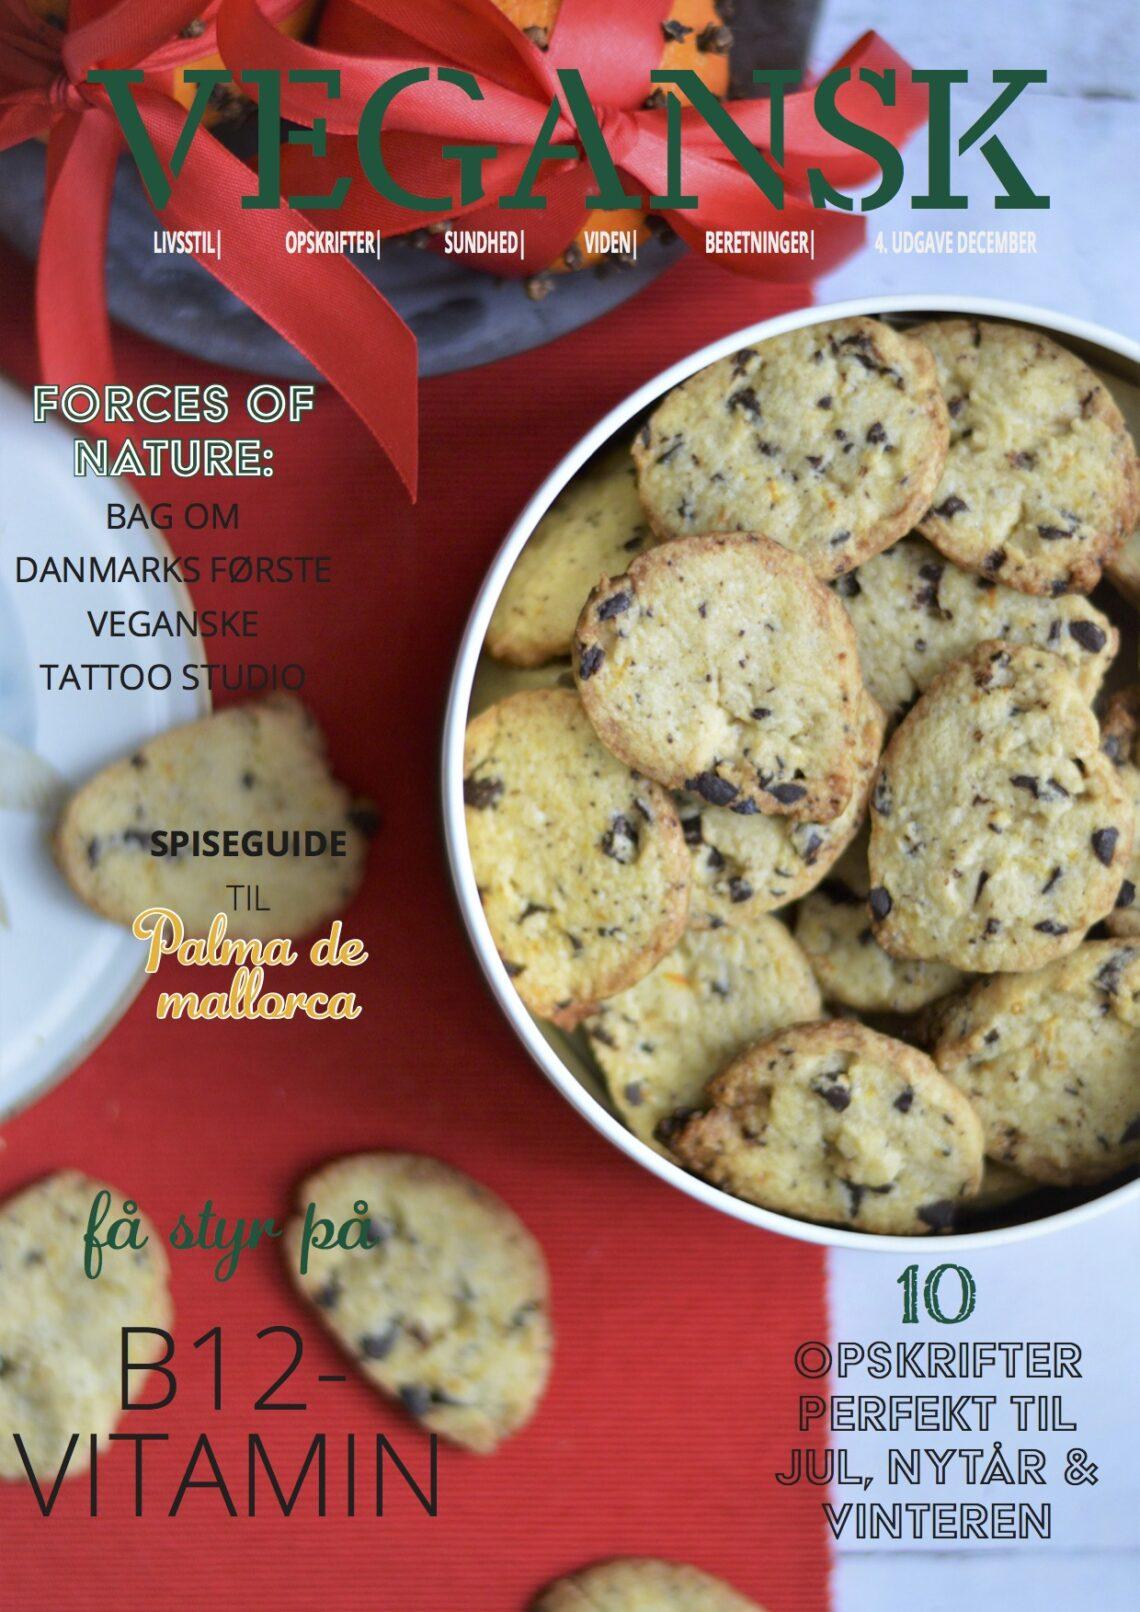 magasinet vegansk, mad med medfølelse, vegansk artikel